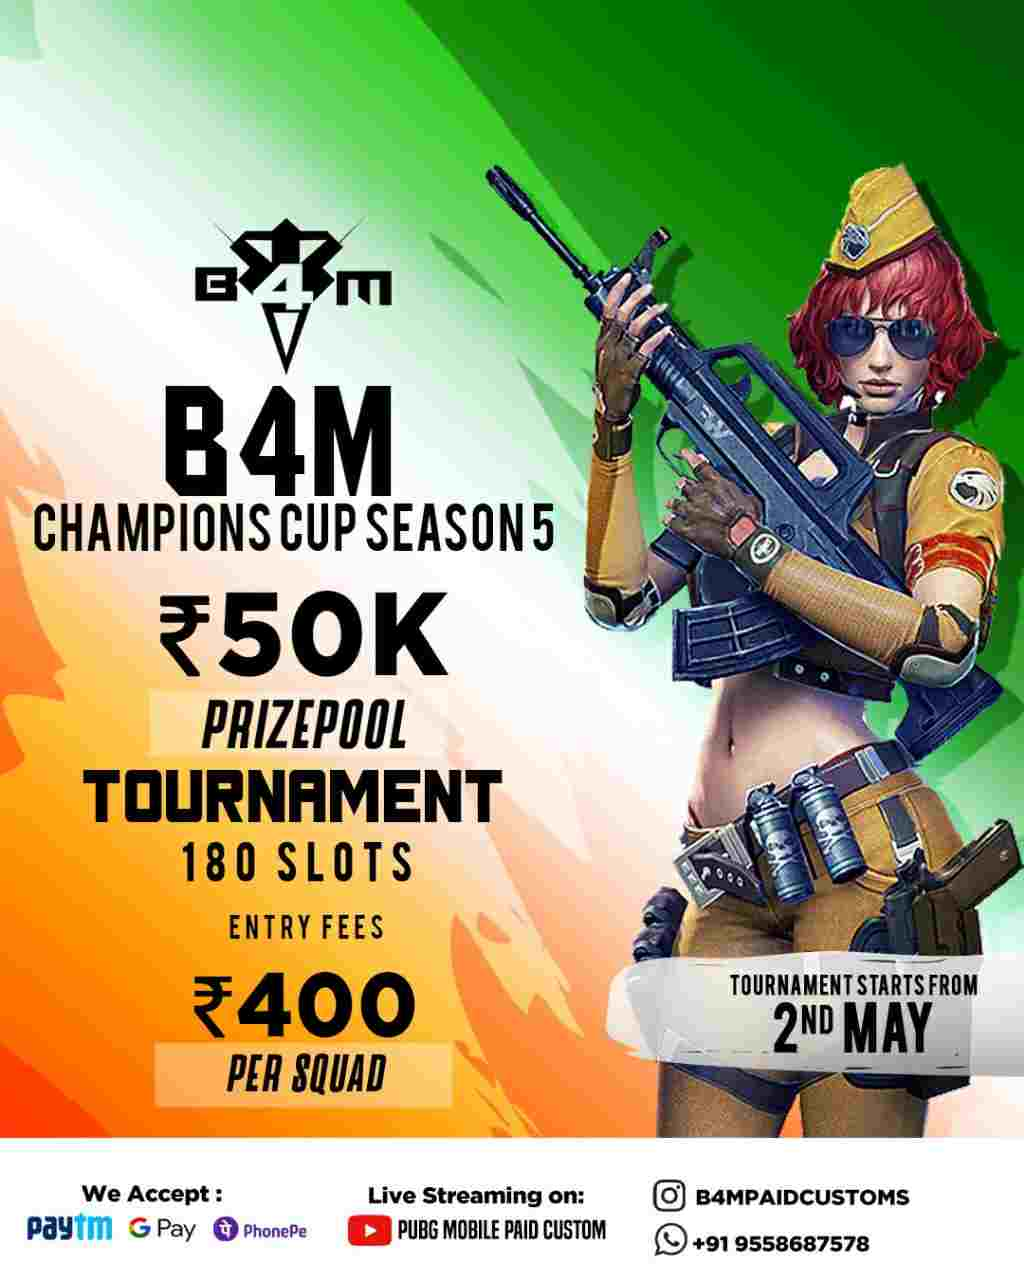 B4M Champions Cup Season 5